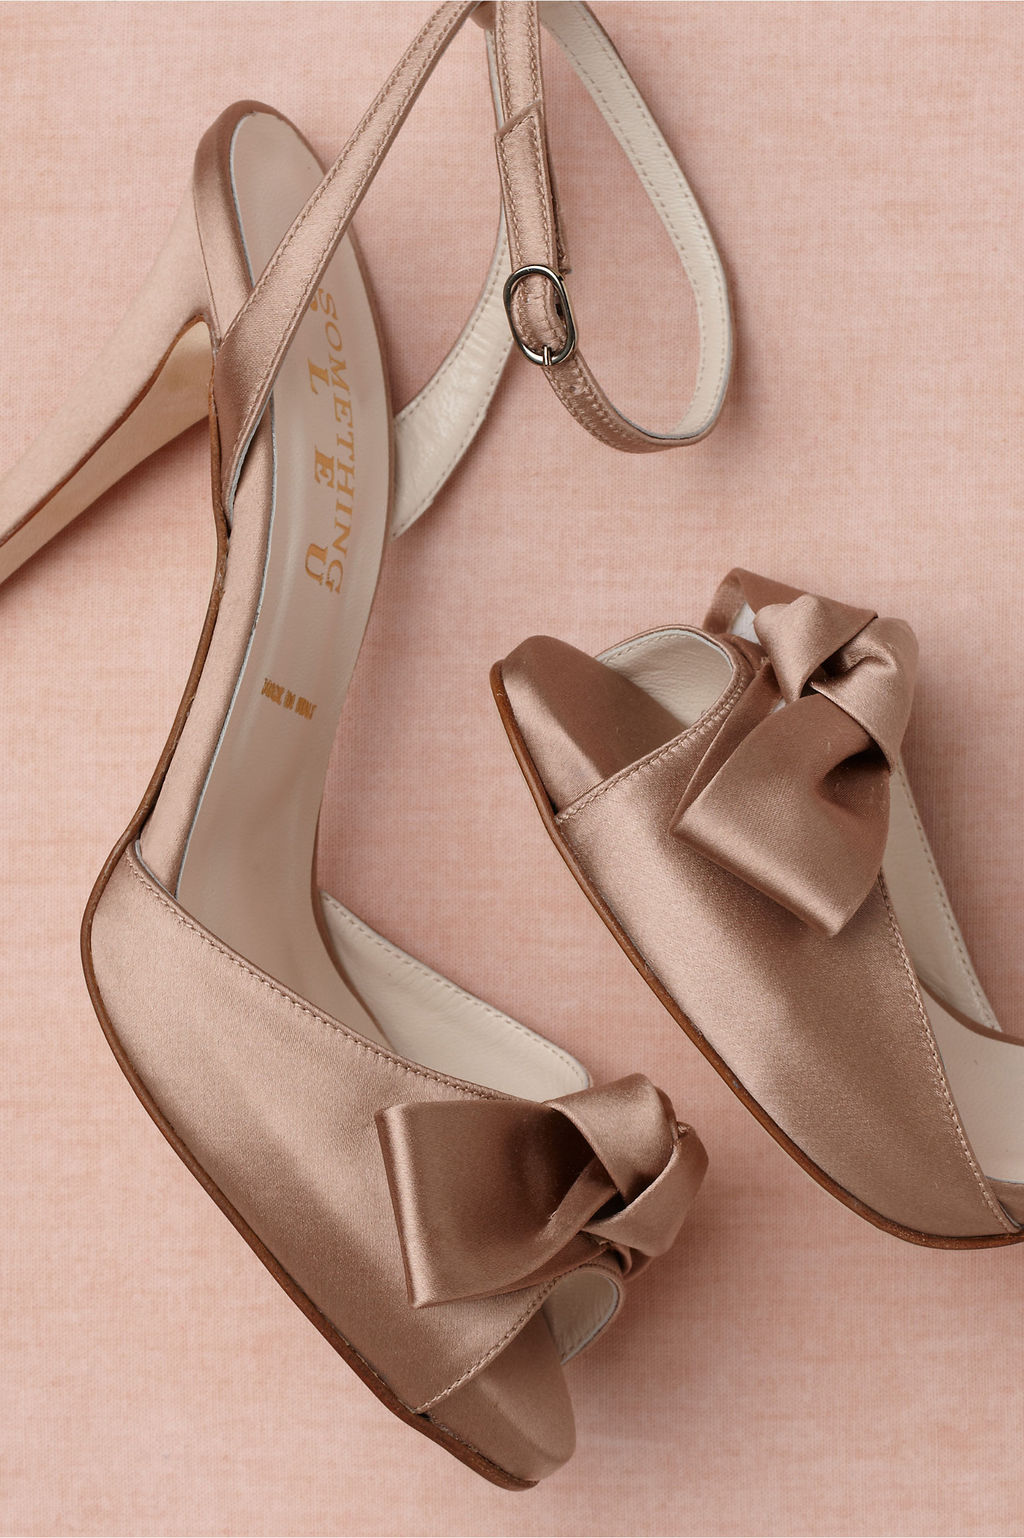 Retro-wedding-shoes-from-bhldn-mauve-satin.full